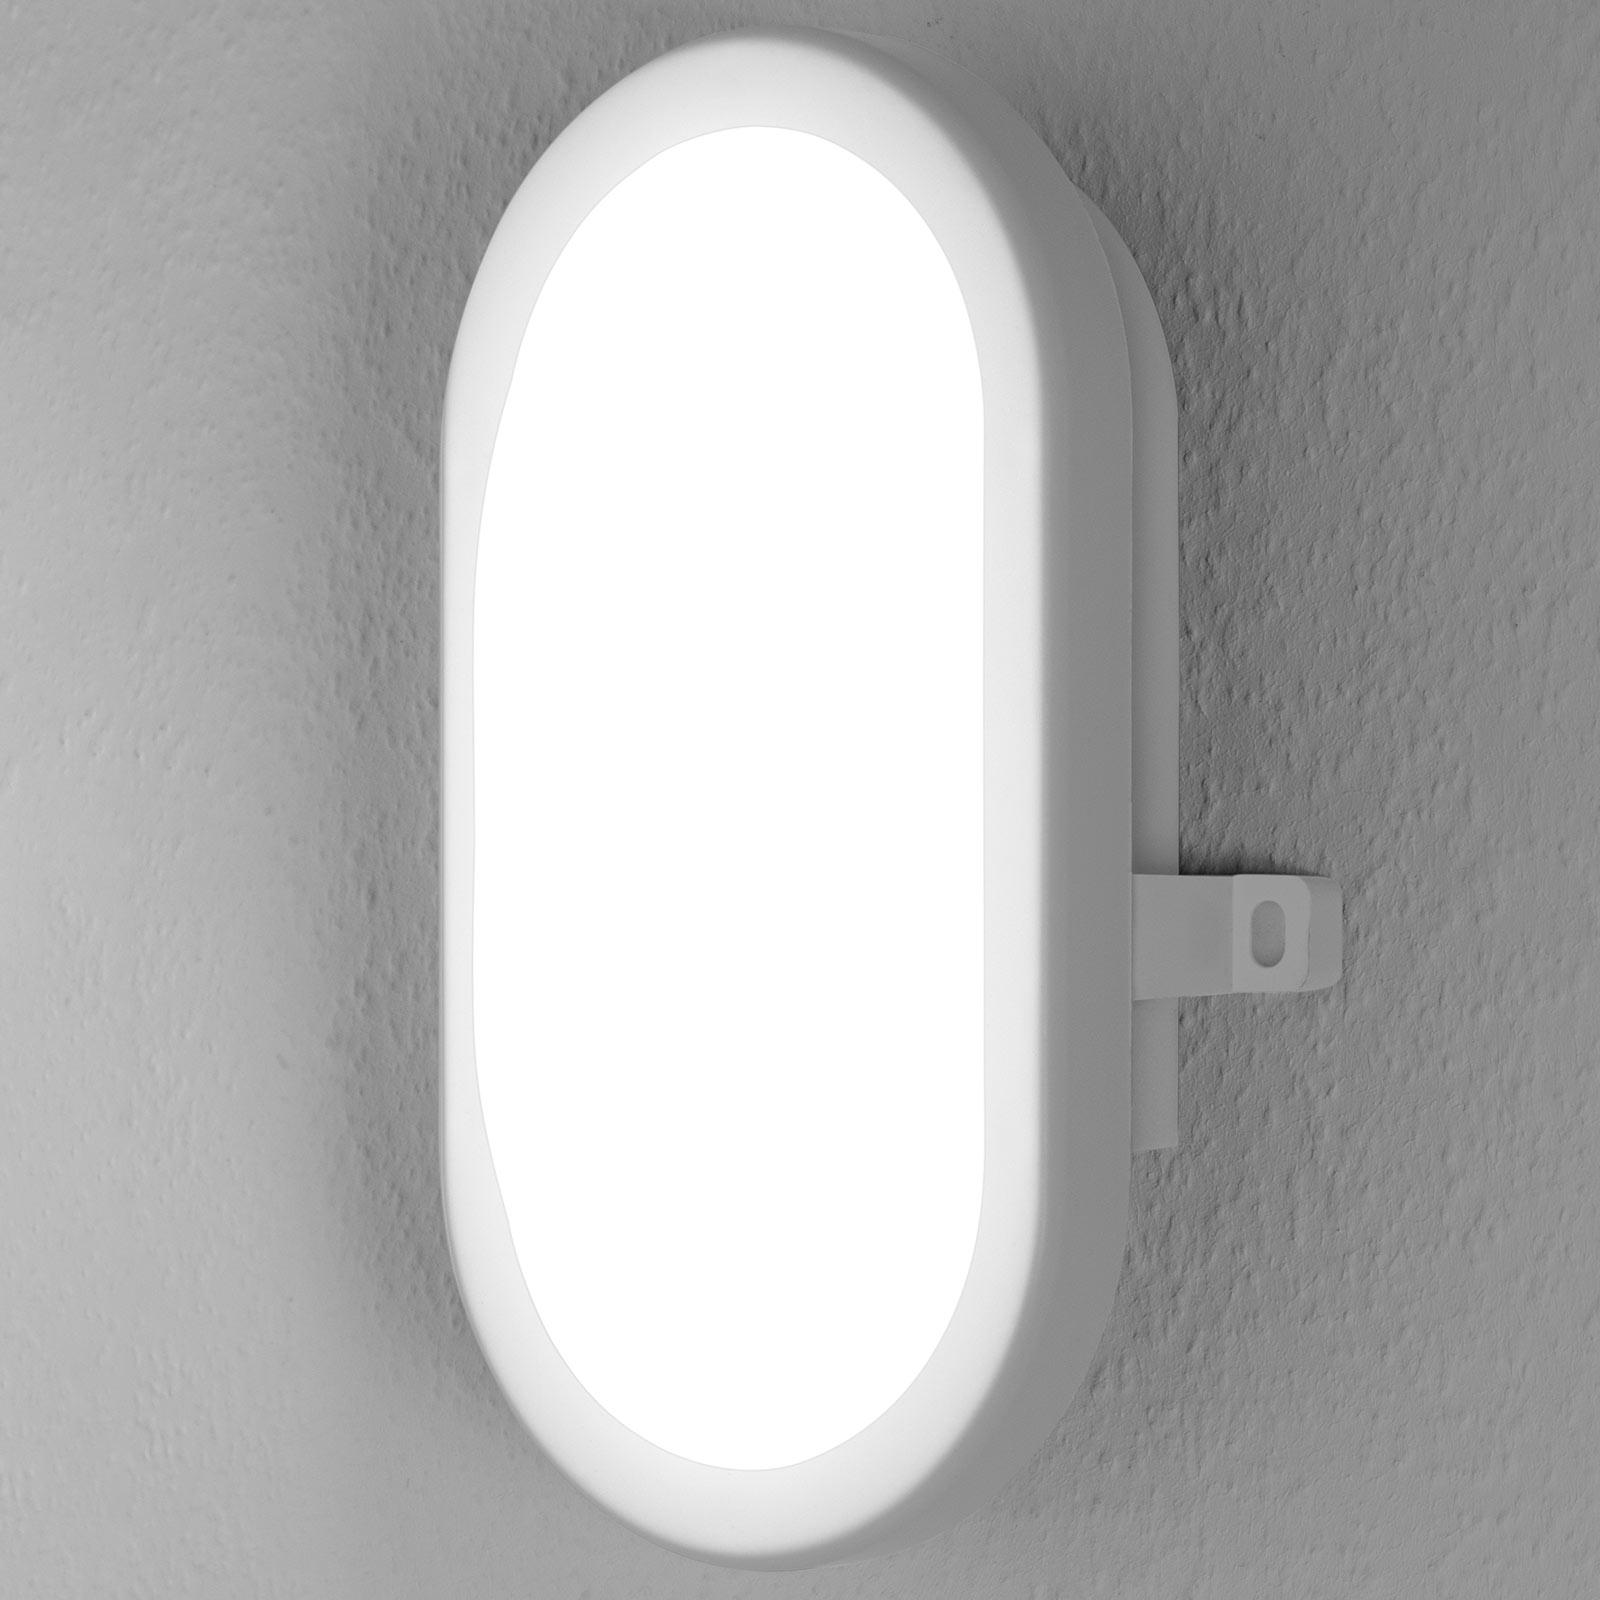 LEDVANCE Bulkhead LED-Außenwandlampe 11W in Weiß